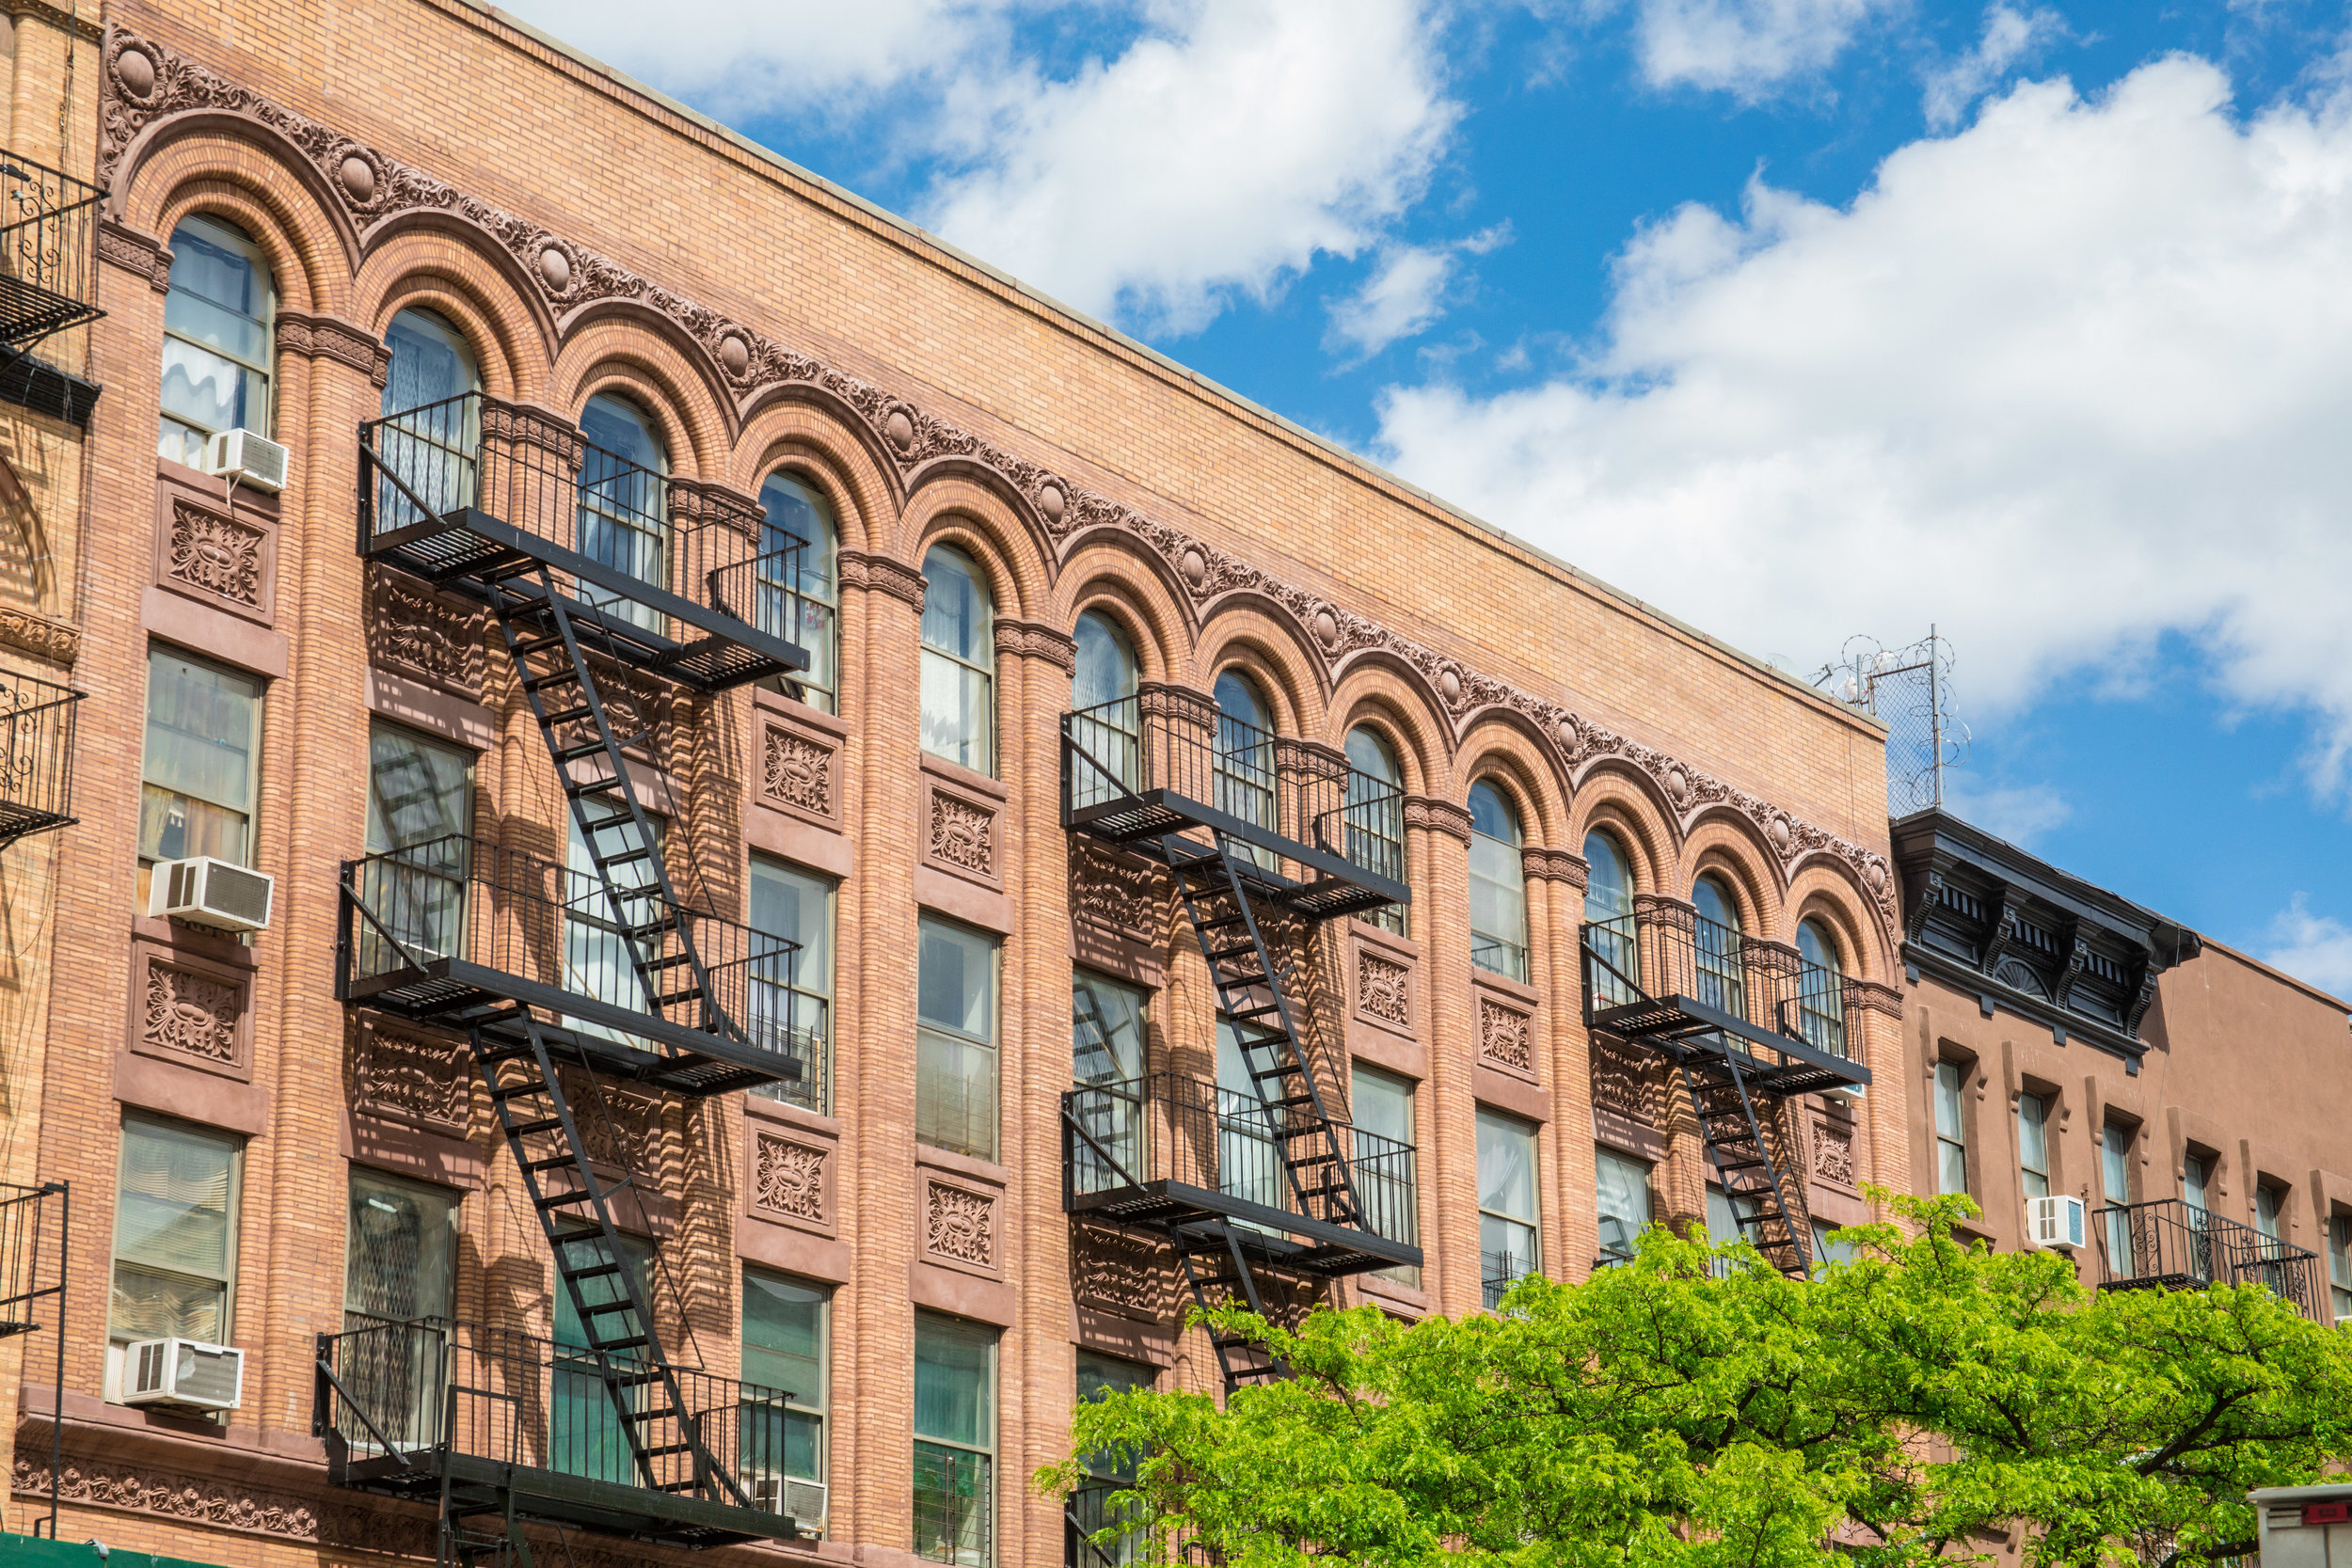 LSNY_Harlem-47.jpg